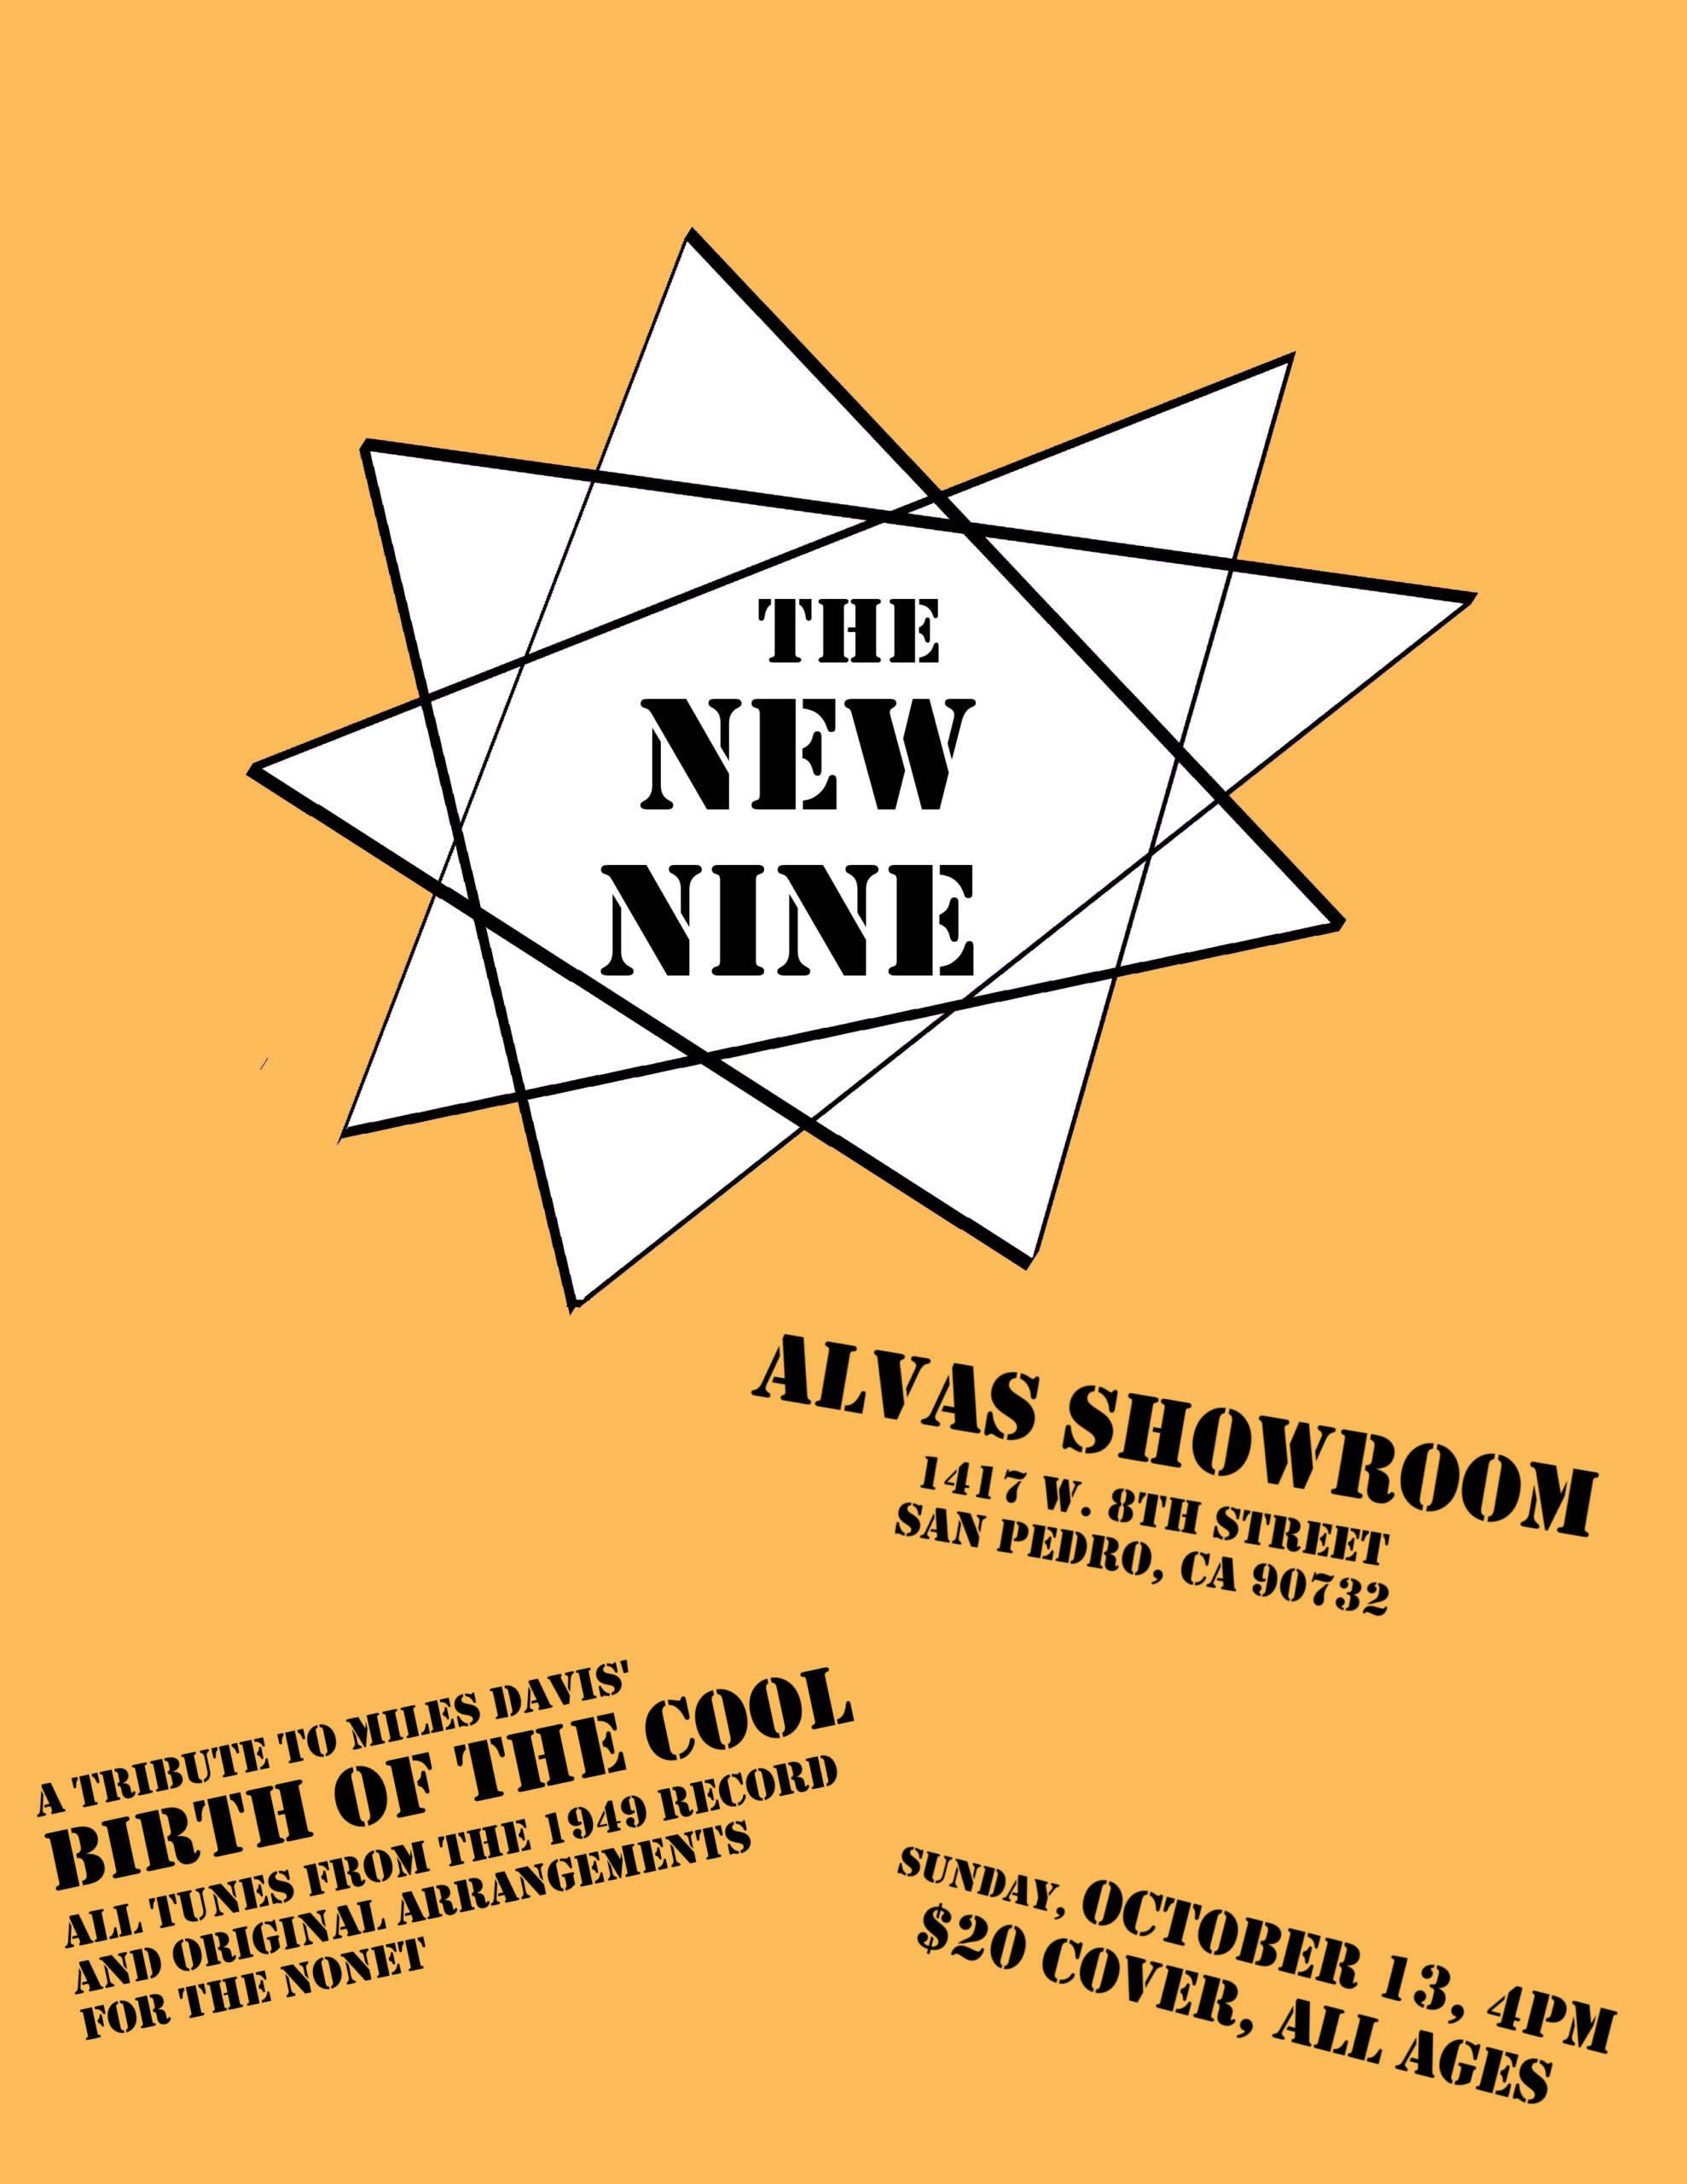 The New Nine Ensemble Poster